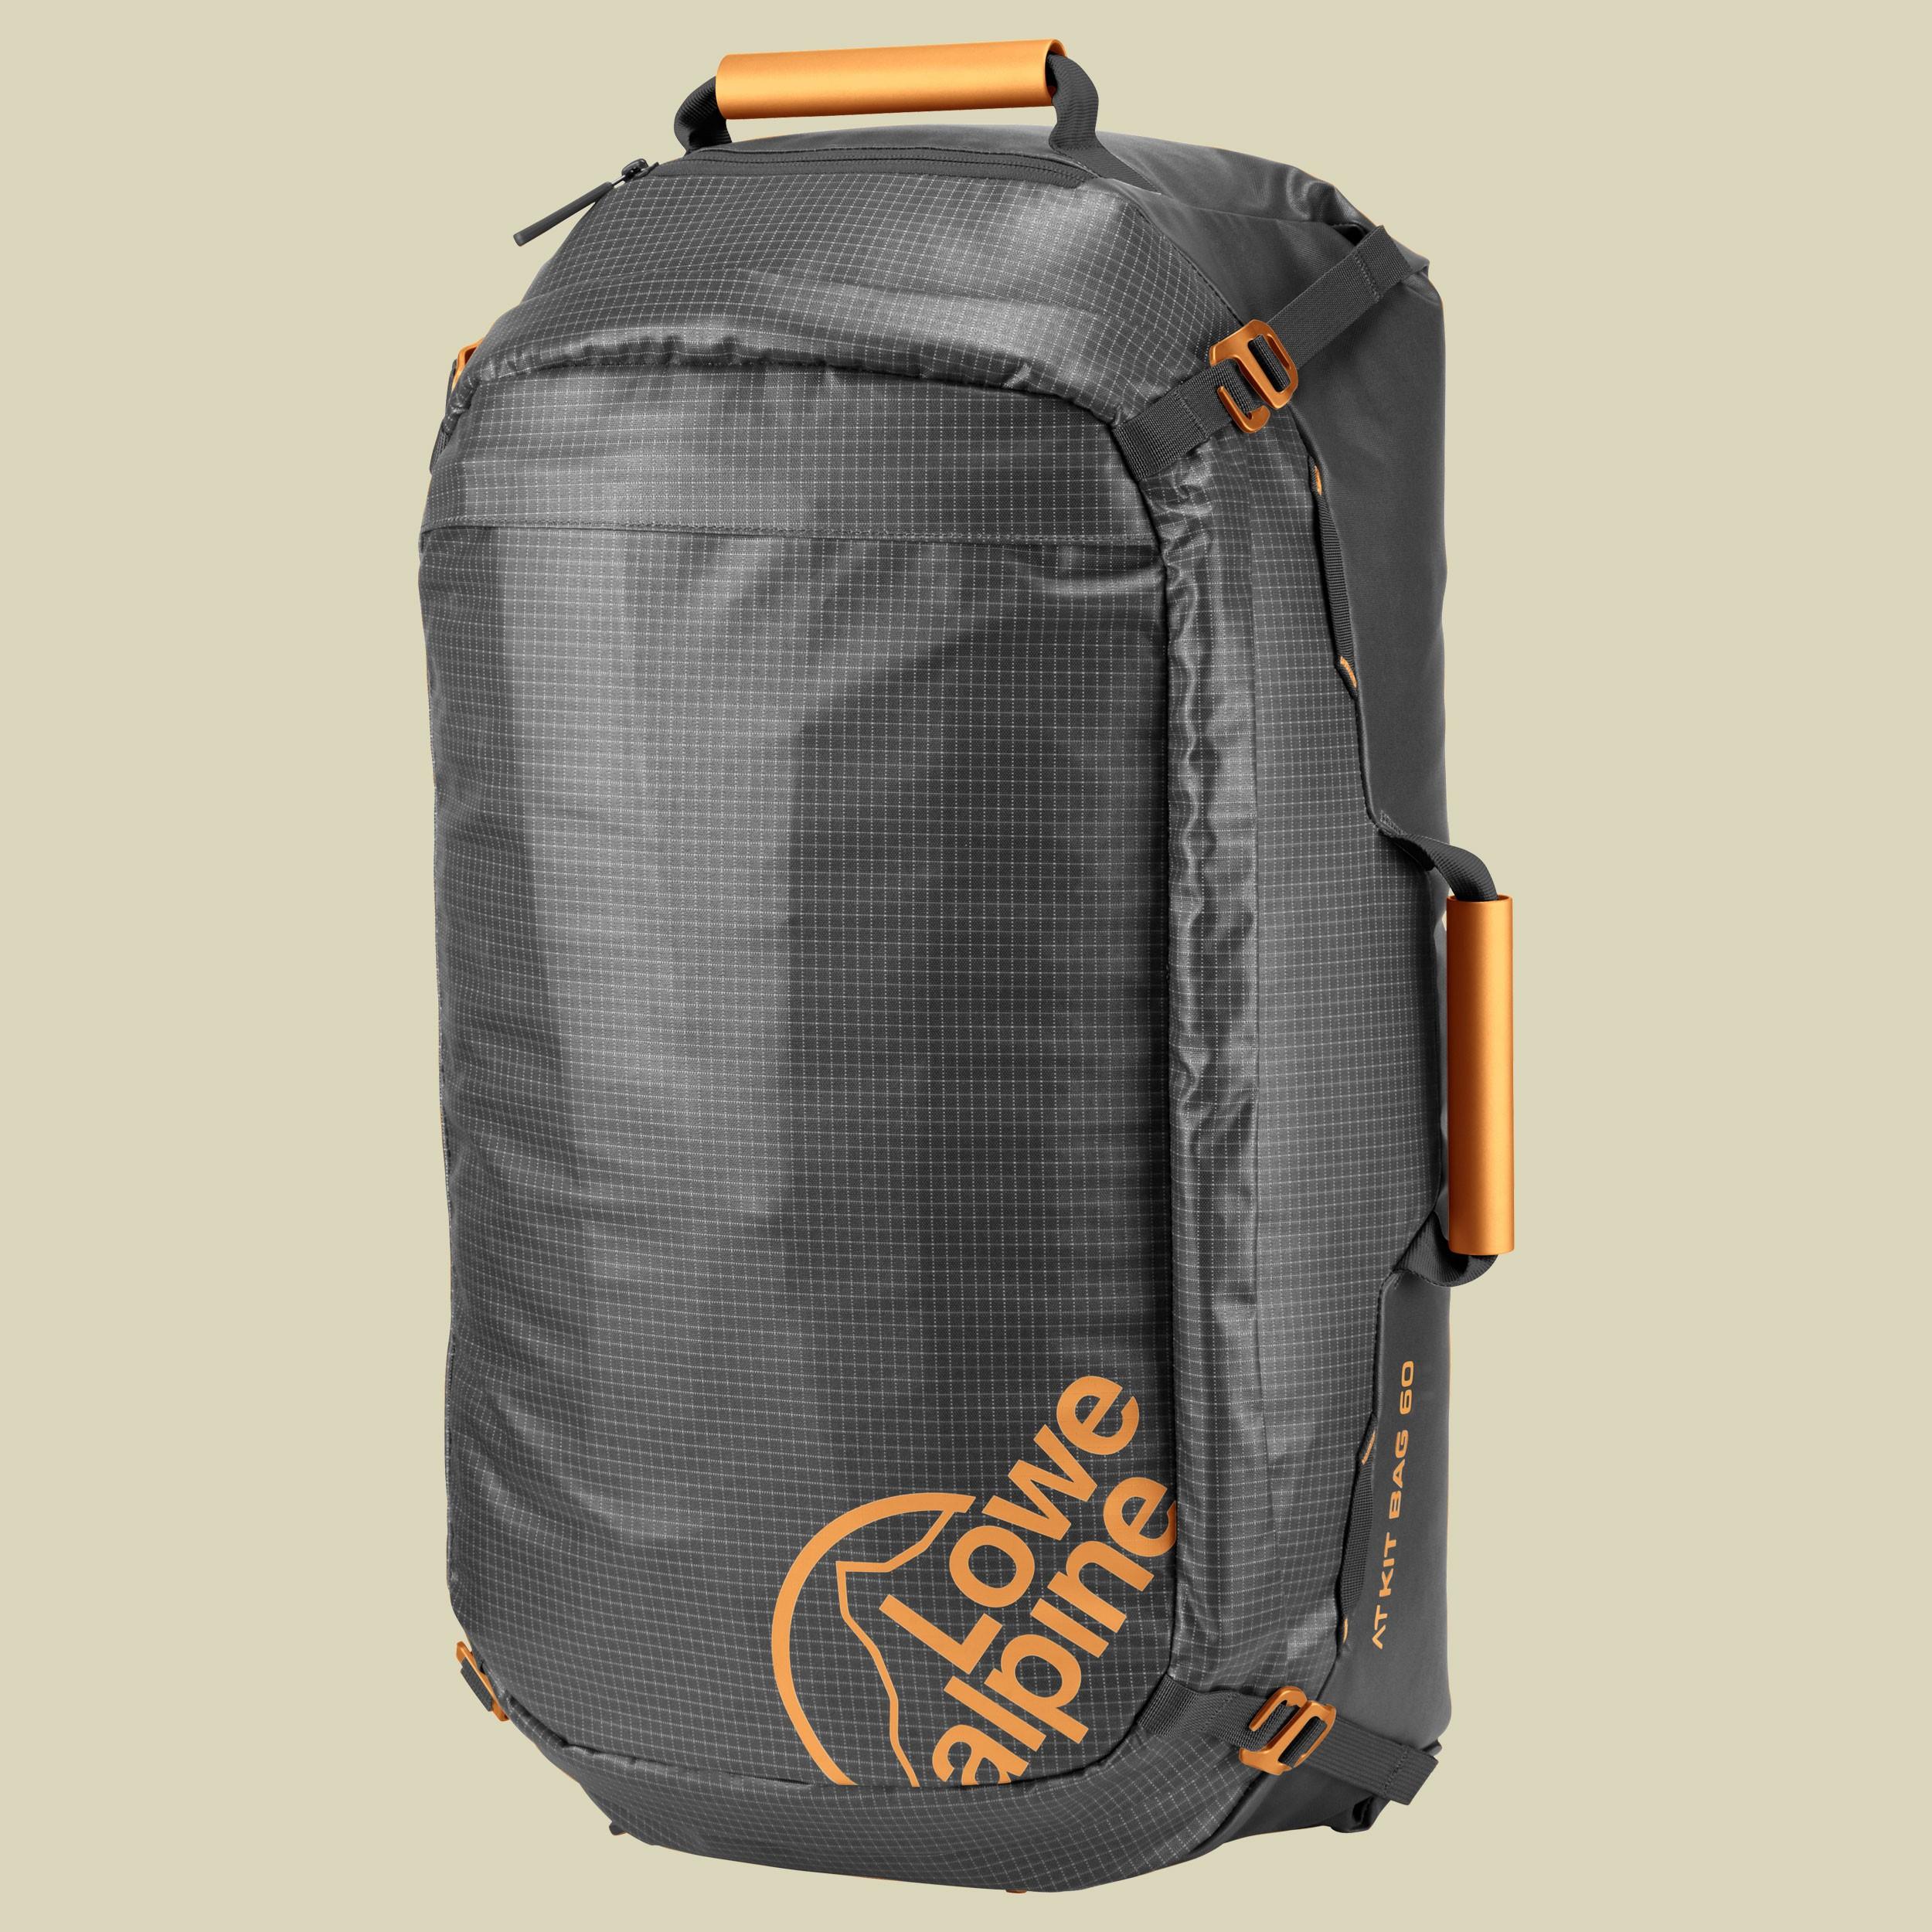 AT Kit bag